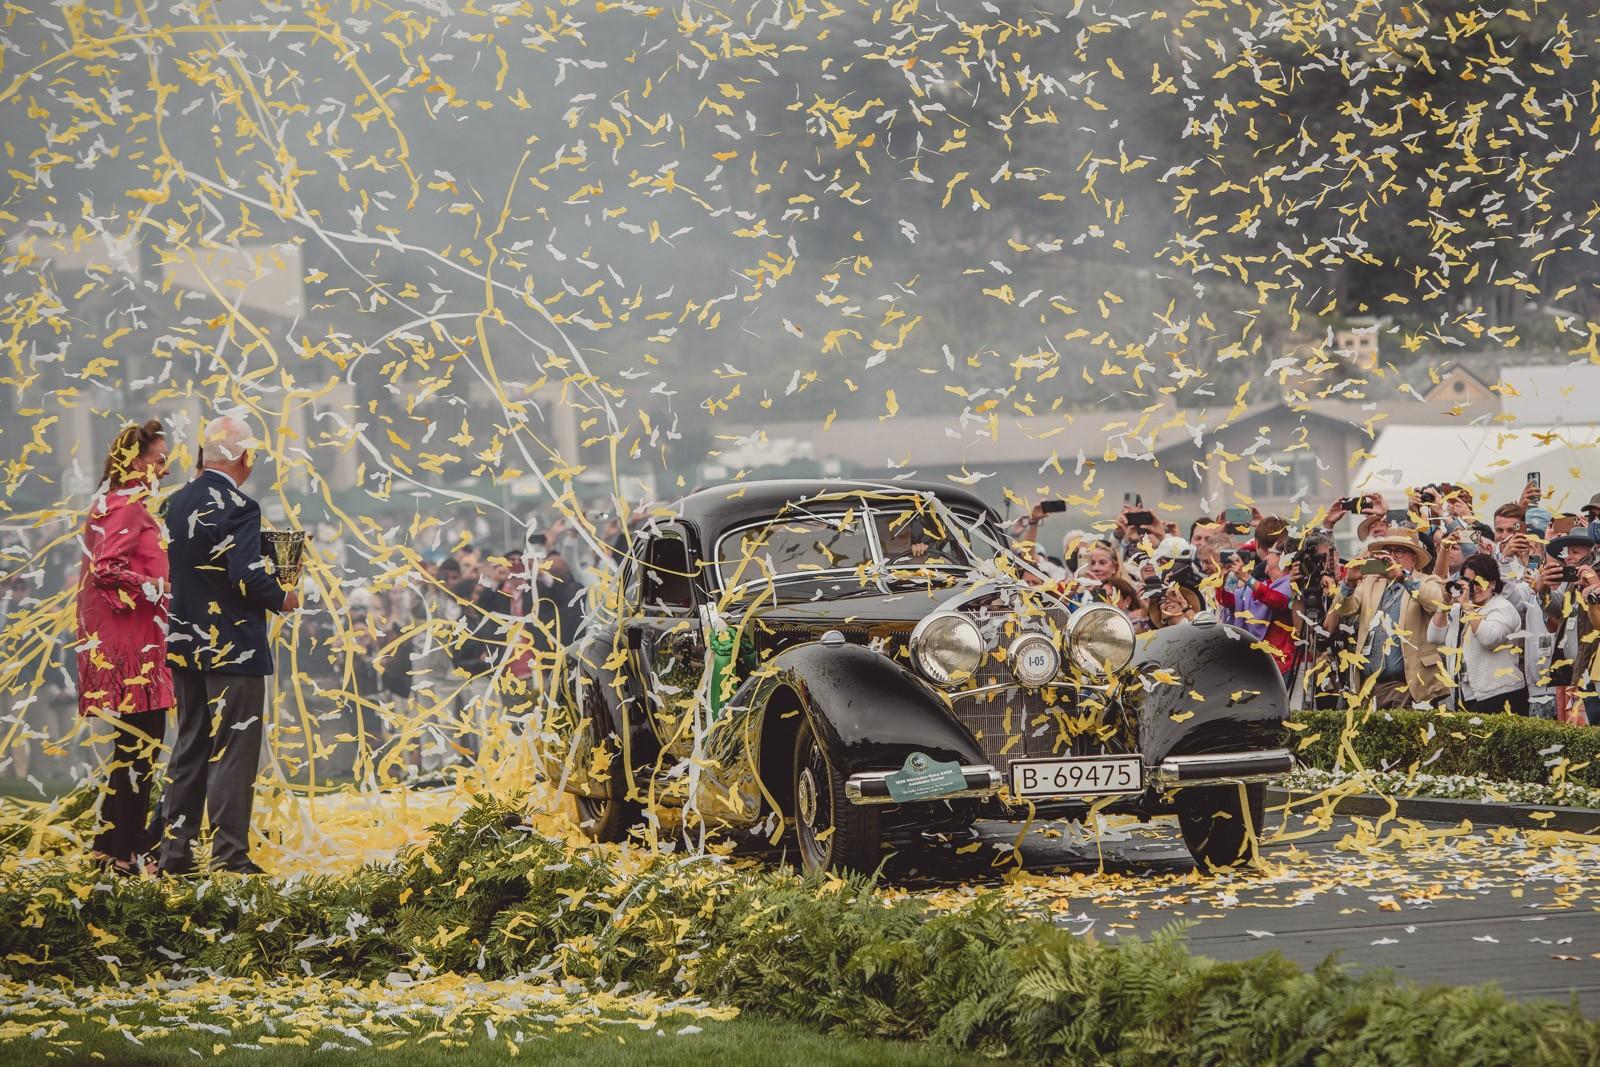 Pebble Beach Concours d'Elegance 2021 'Best of Show' Winner - 1938 Mercedes Benz 540K Autobahn Kurier